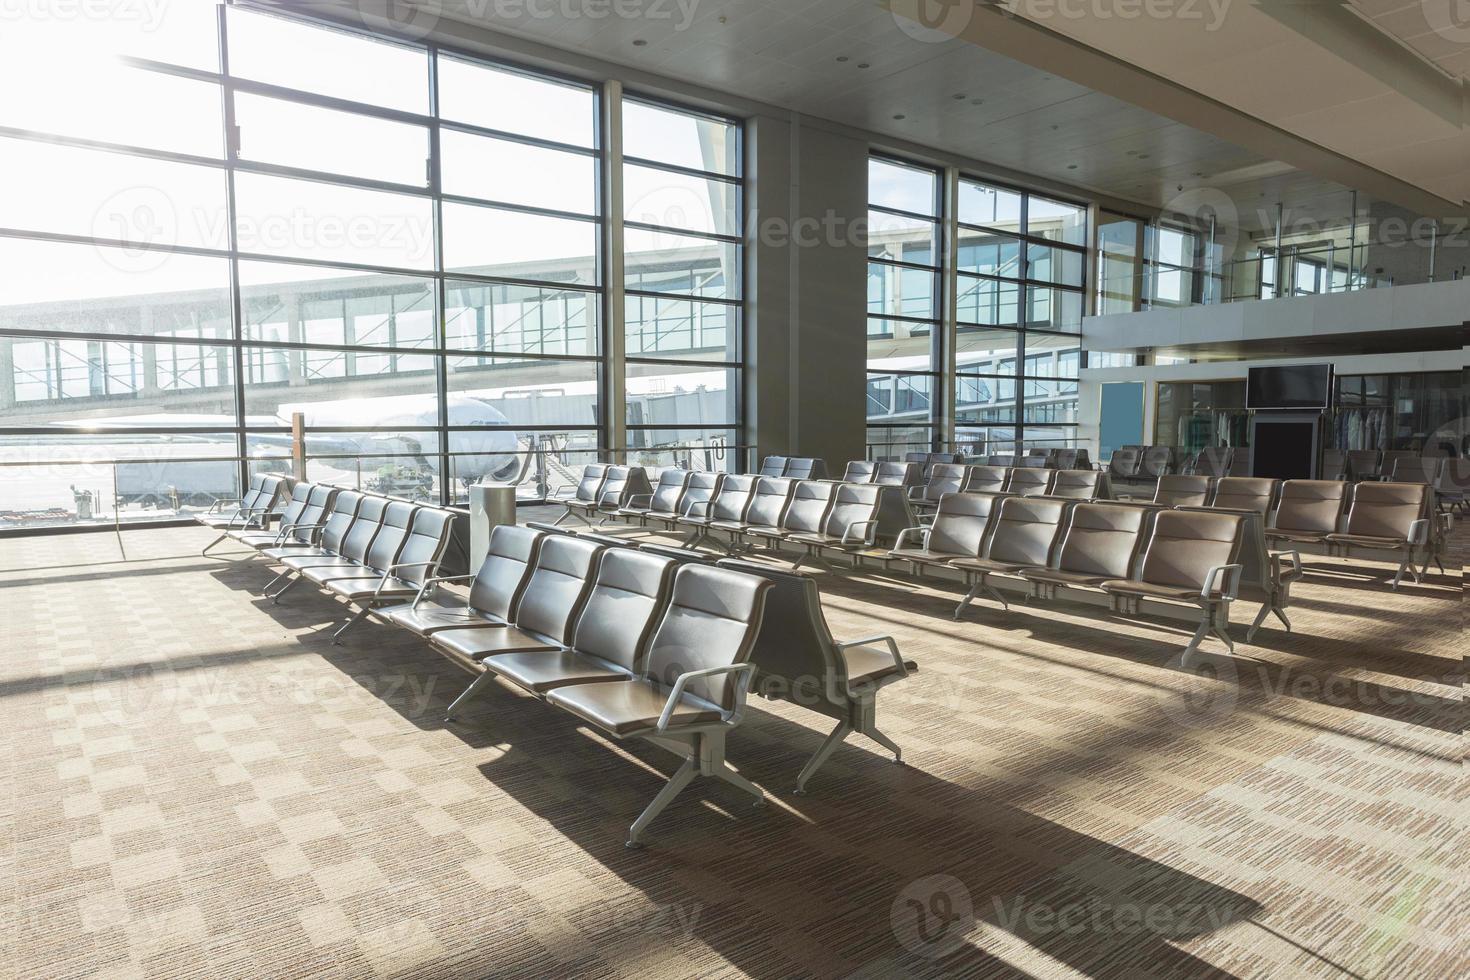 Innenraum des Flughafenkorridors foto